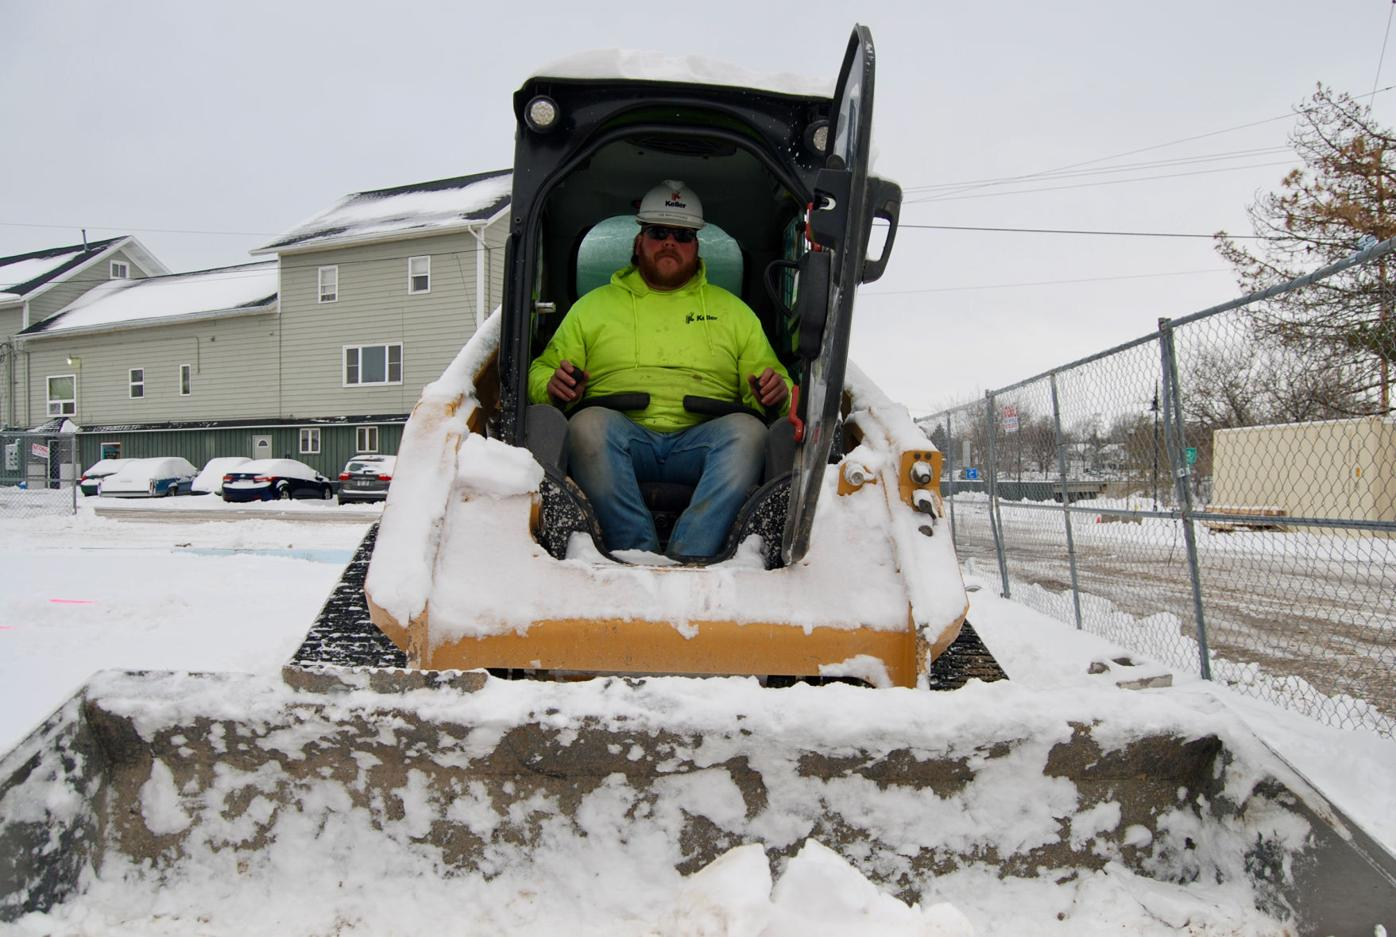 Keller in the snow